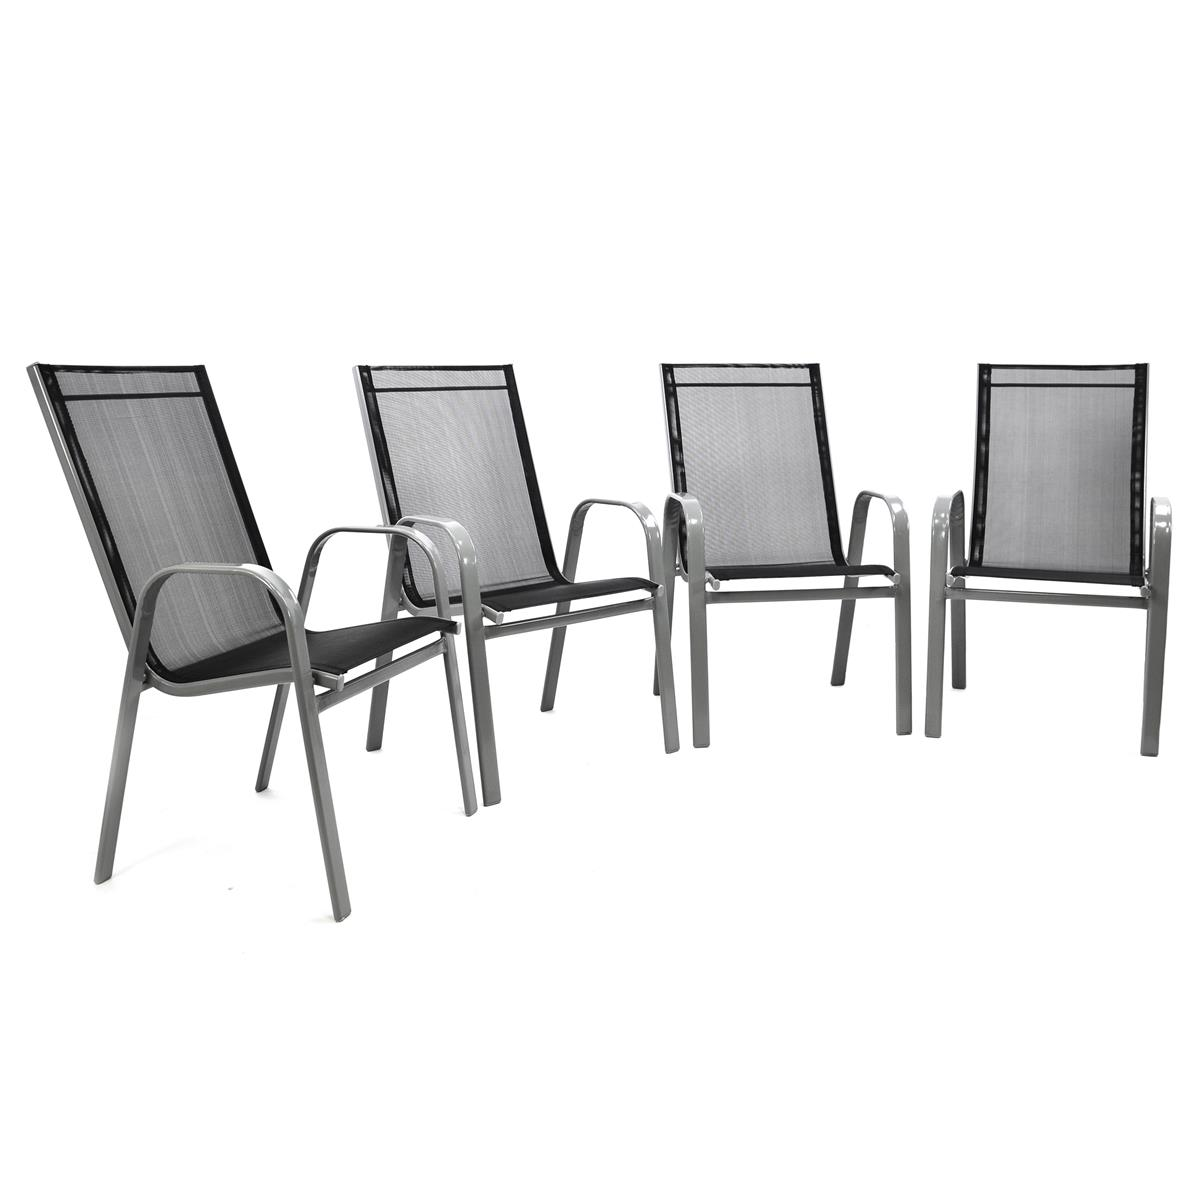 4er Set Gartenstuhl Stapelstuhl B-WARE Stahl-Rahmen dunkelgrau Bezug Schwarz